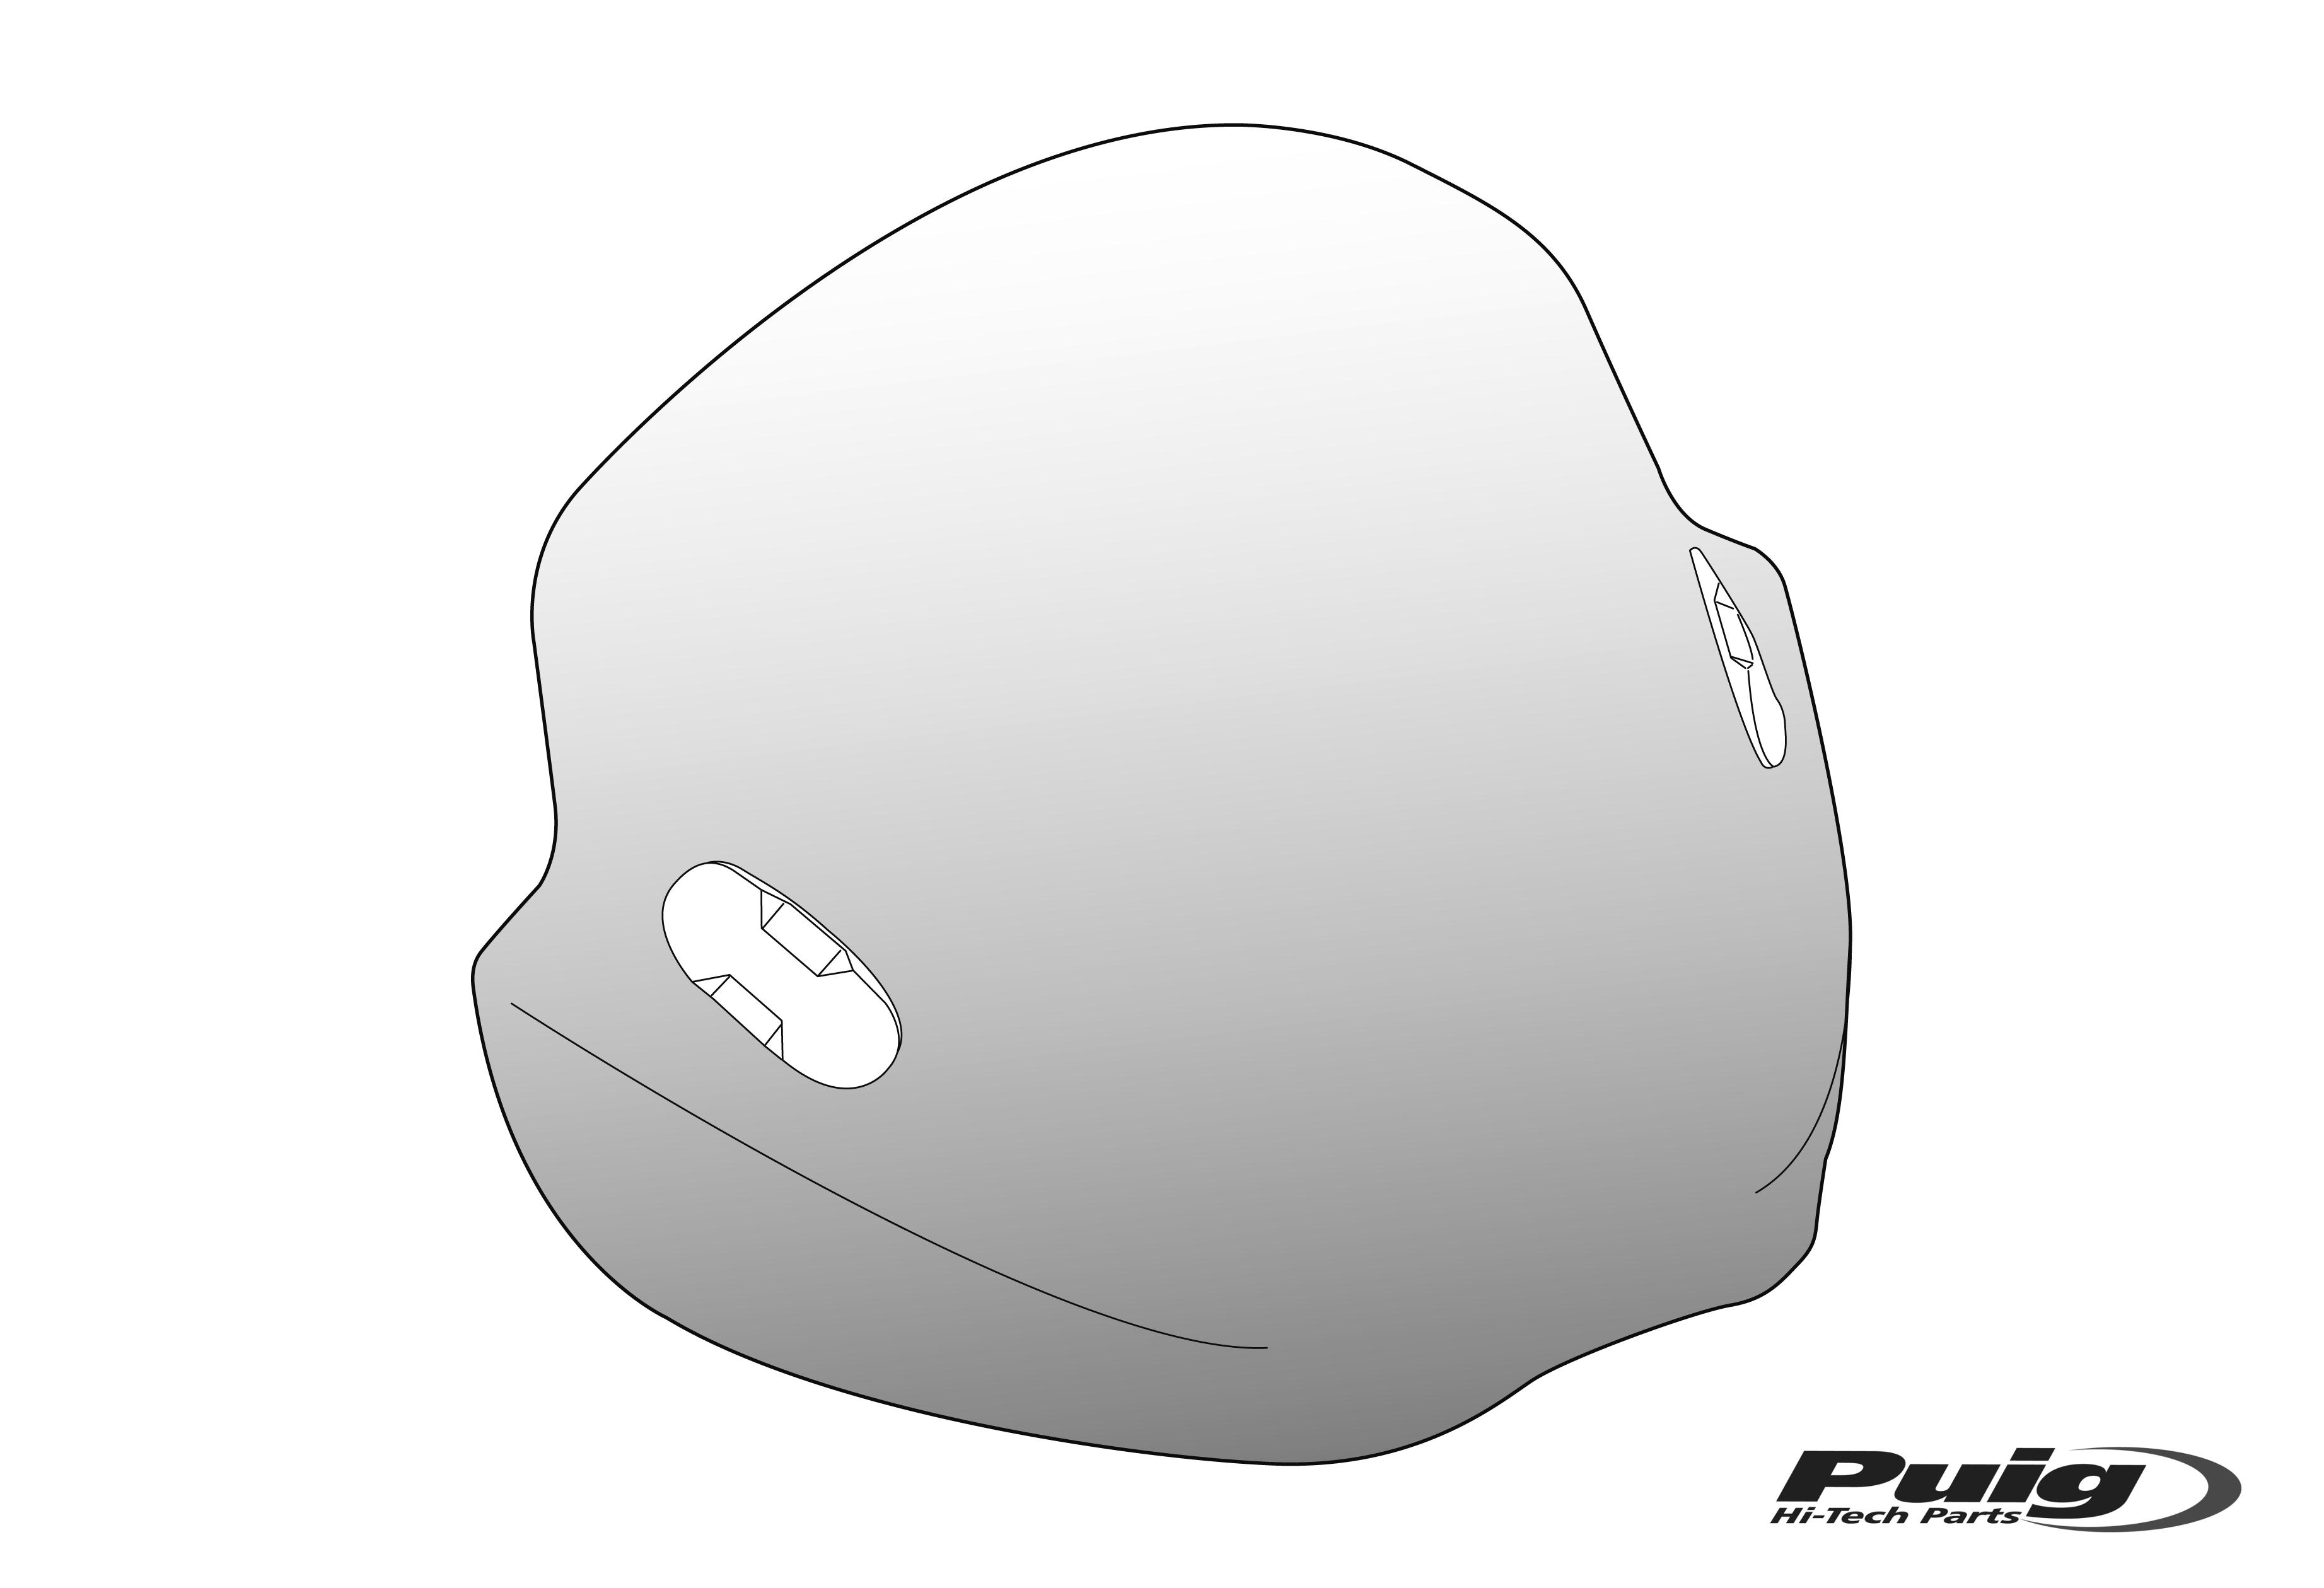 Productos Motoplastic Puig 2000 Ducati Monster Wiring Diagram Carenabrises Universales Para Faros No Redondos